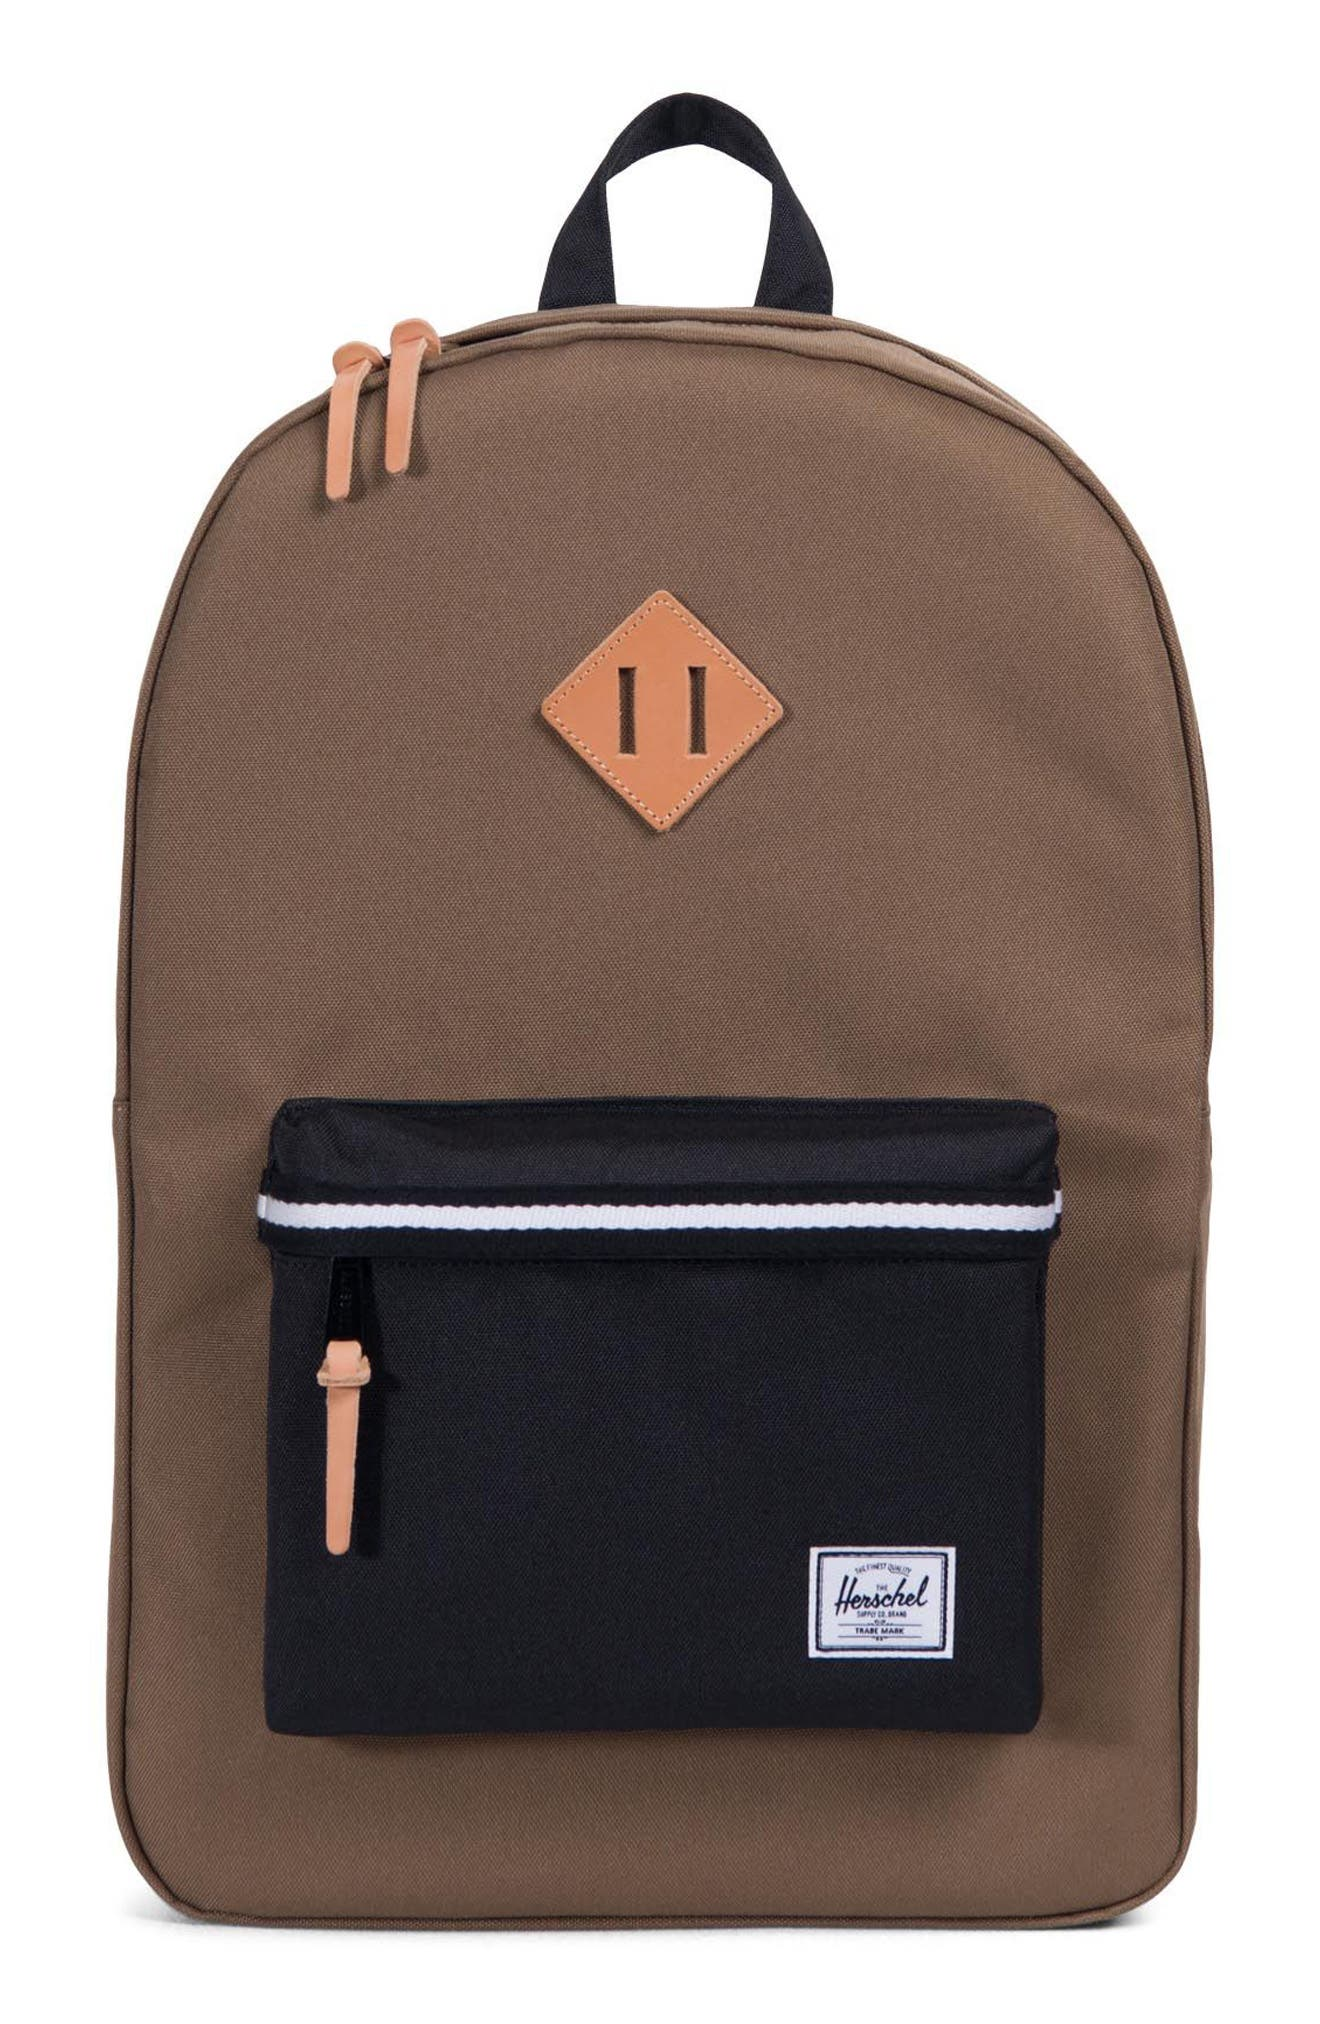 Heritage Offset Stripe Backpack,                         Main,                         color, Cub/ Black/ White